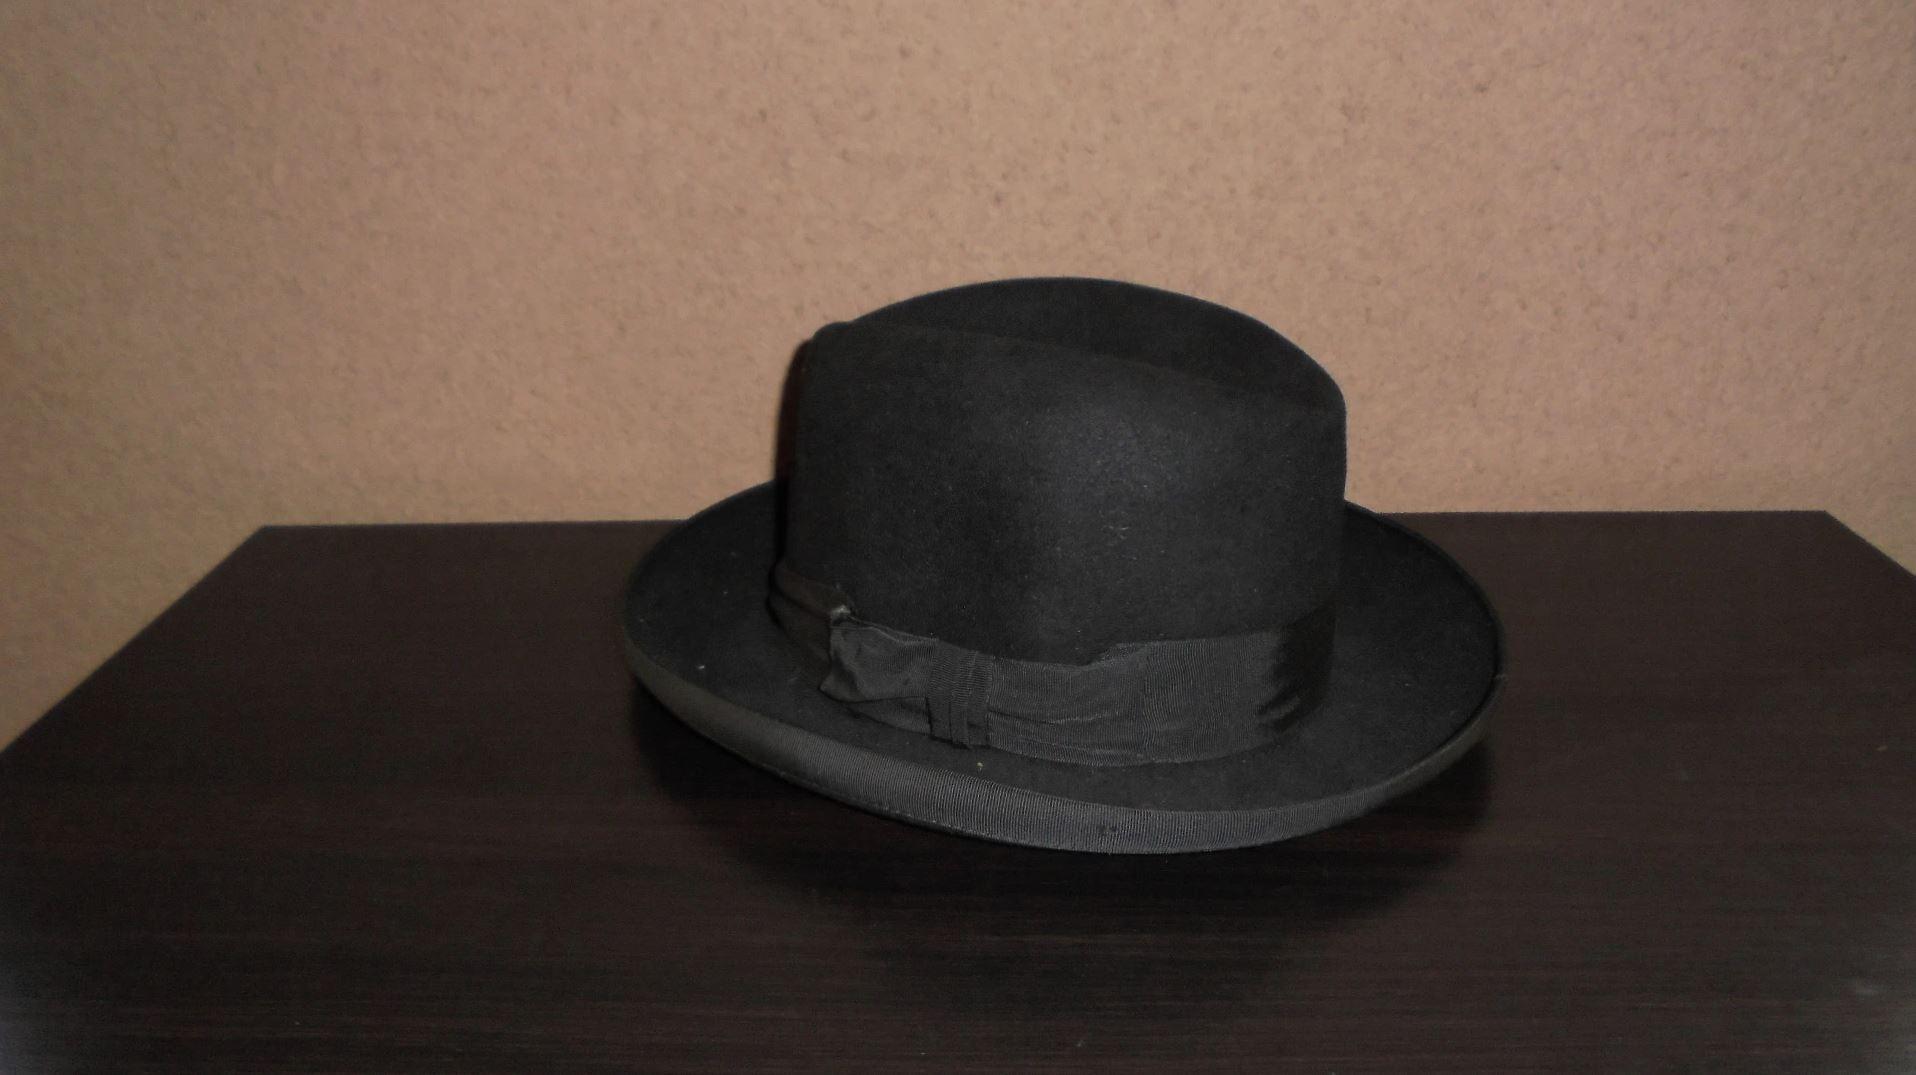 STARY KAPELUSZ THE HOLBORN HAT LONDON 7617356901 2.jpg